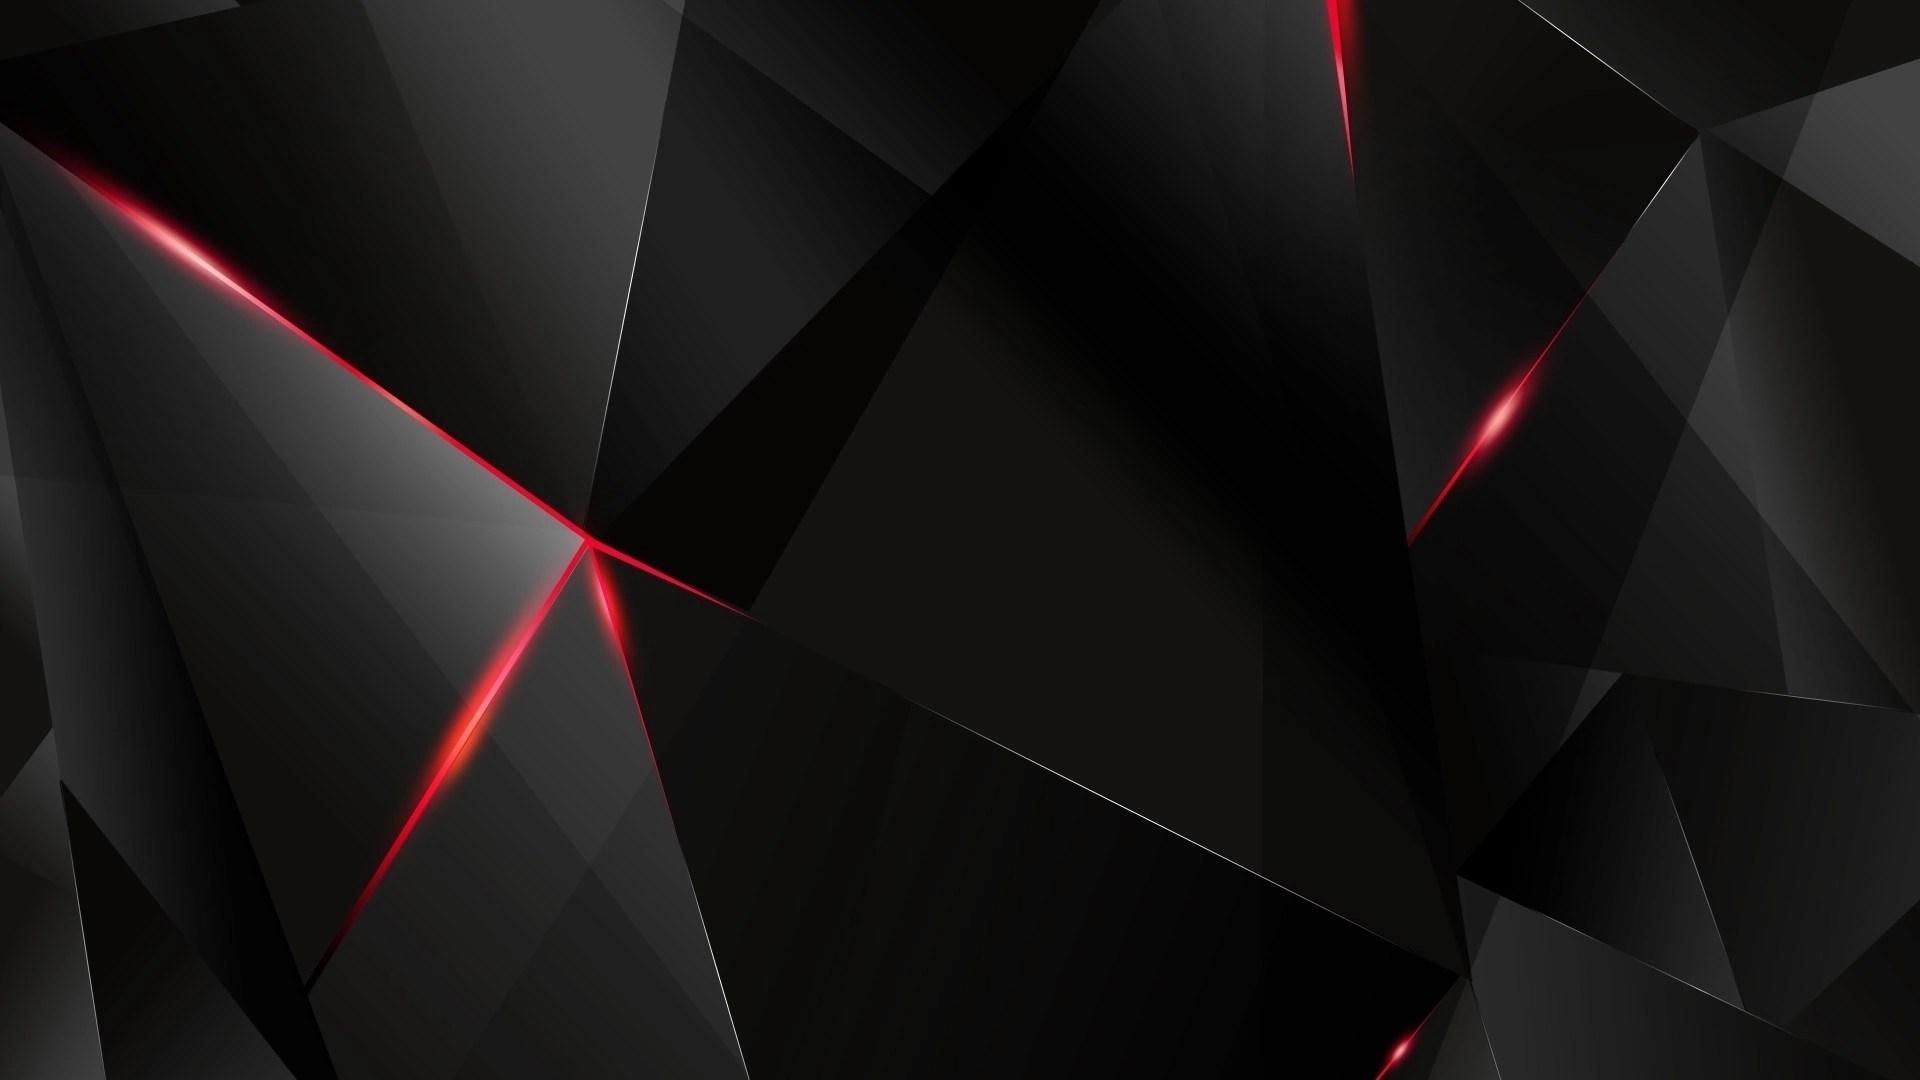 Black Wallpaper wth red 3D effect